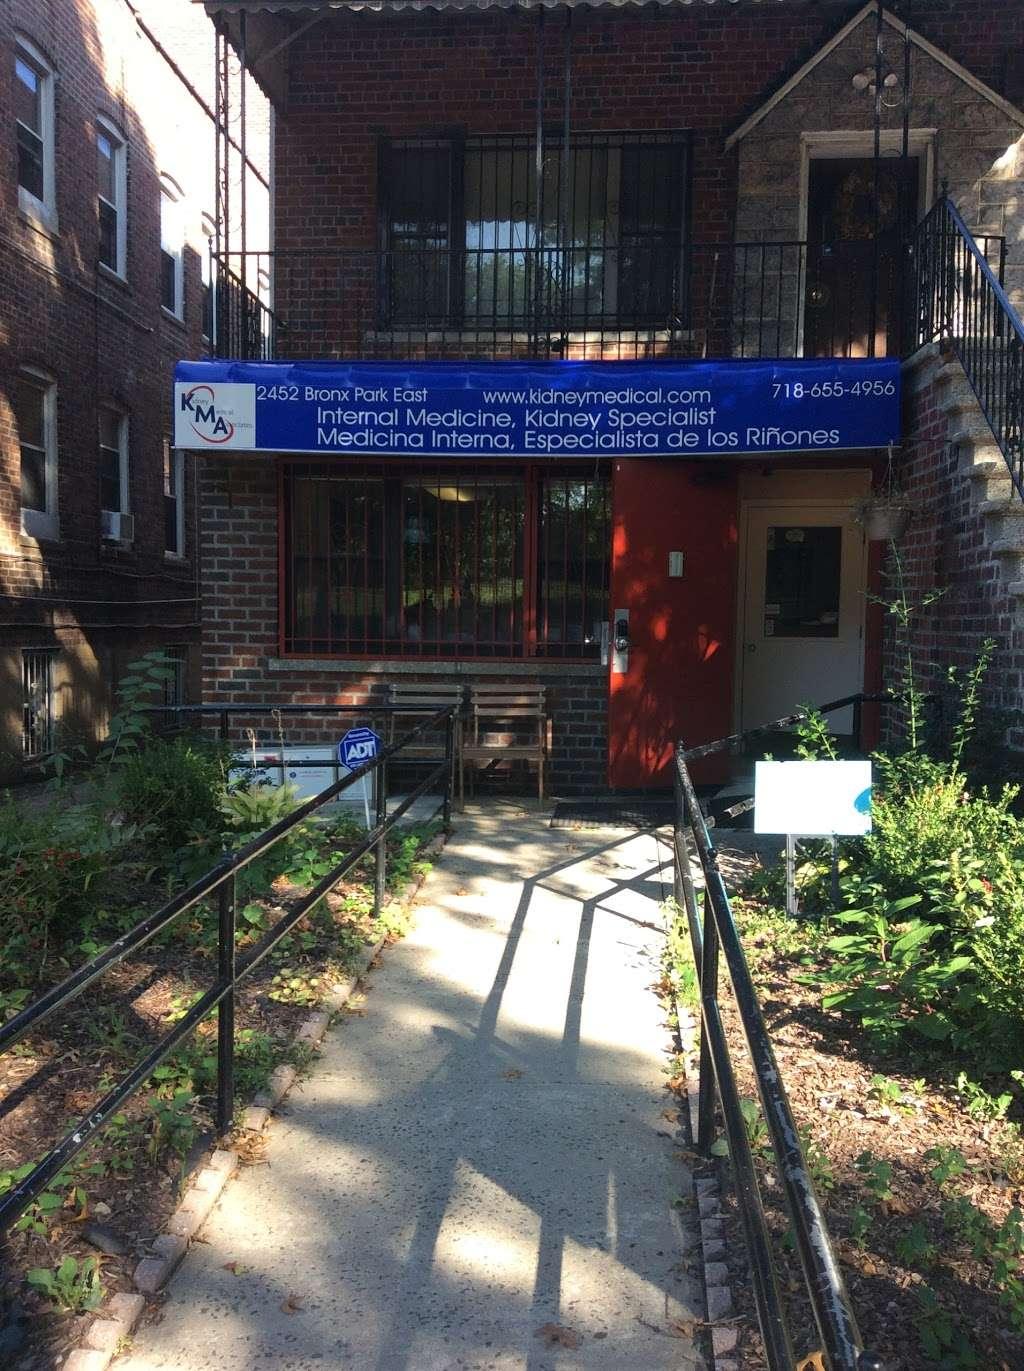 Kidney Medical Associates - health    Photo 1 of 2   Address: 2456 Bronx Park E, The Bronx, NY 10467, USA   Phone: (718) 655-4956